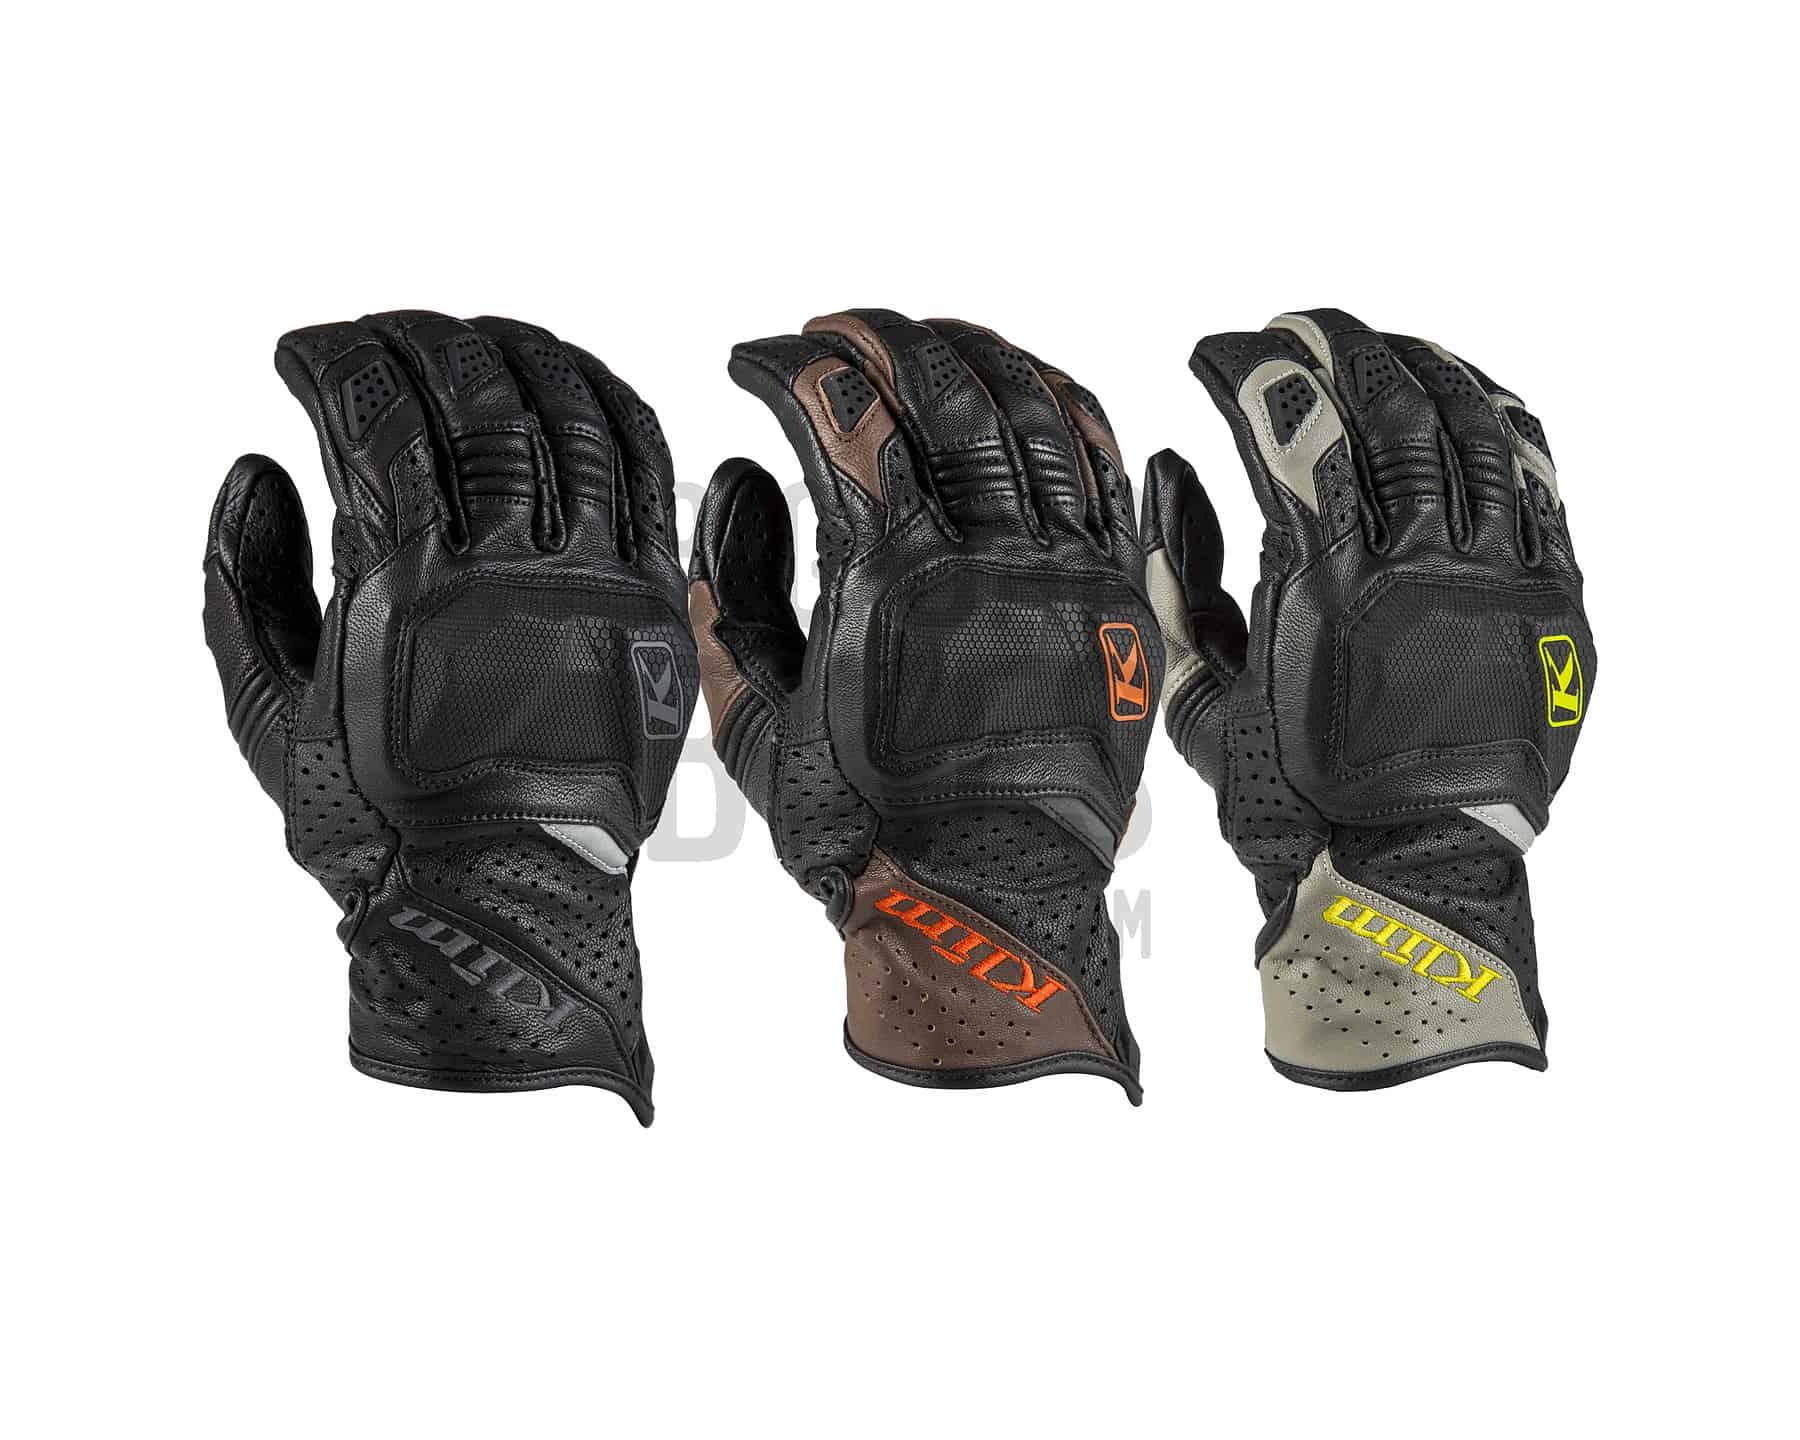 Badlands Aero Pro Short Glove_3924-000_Black_Feature_01